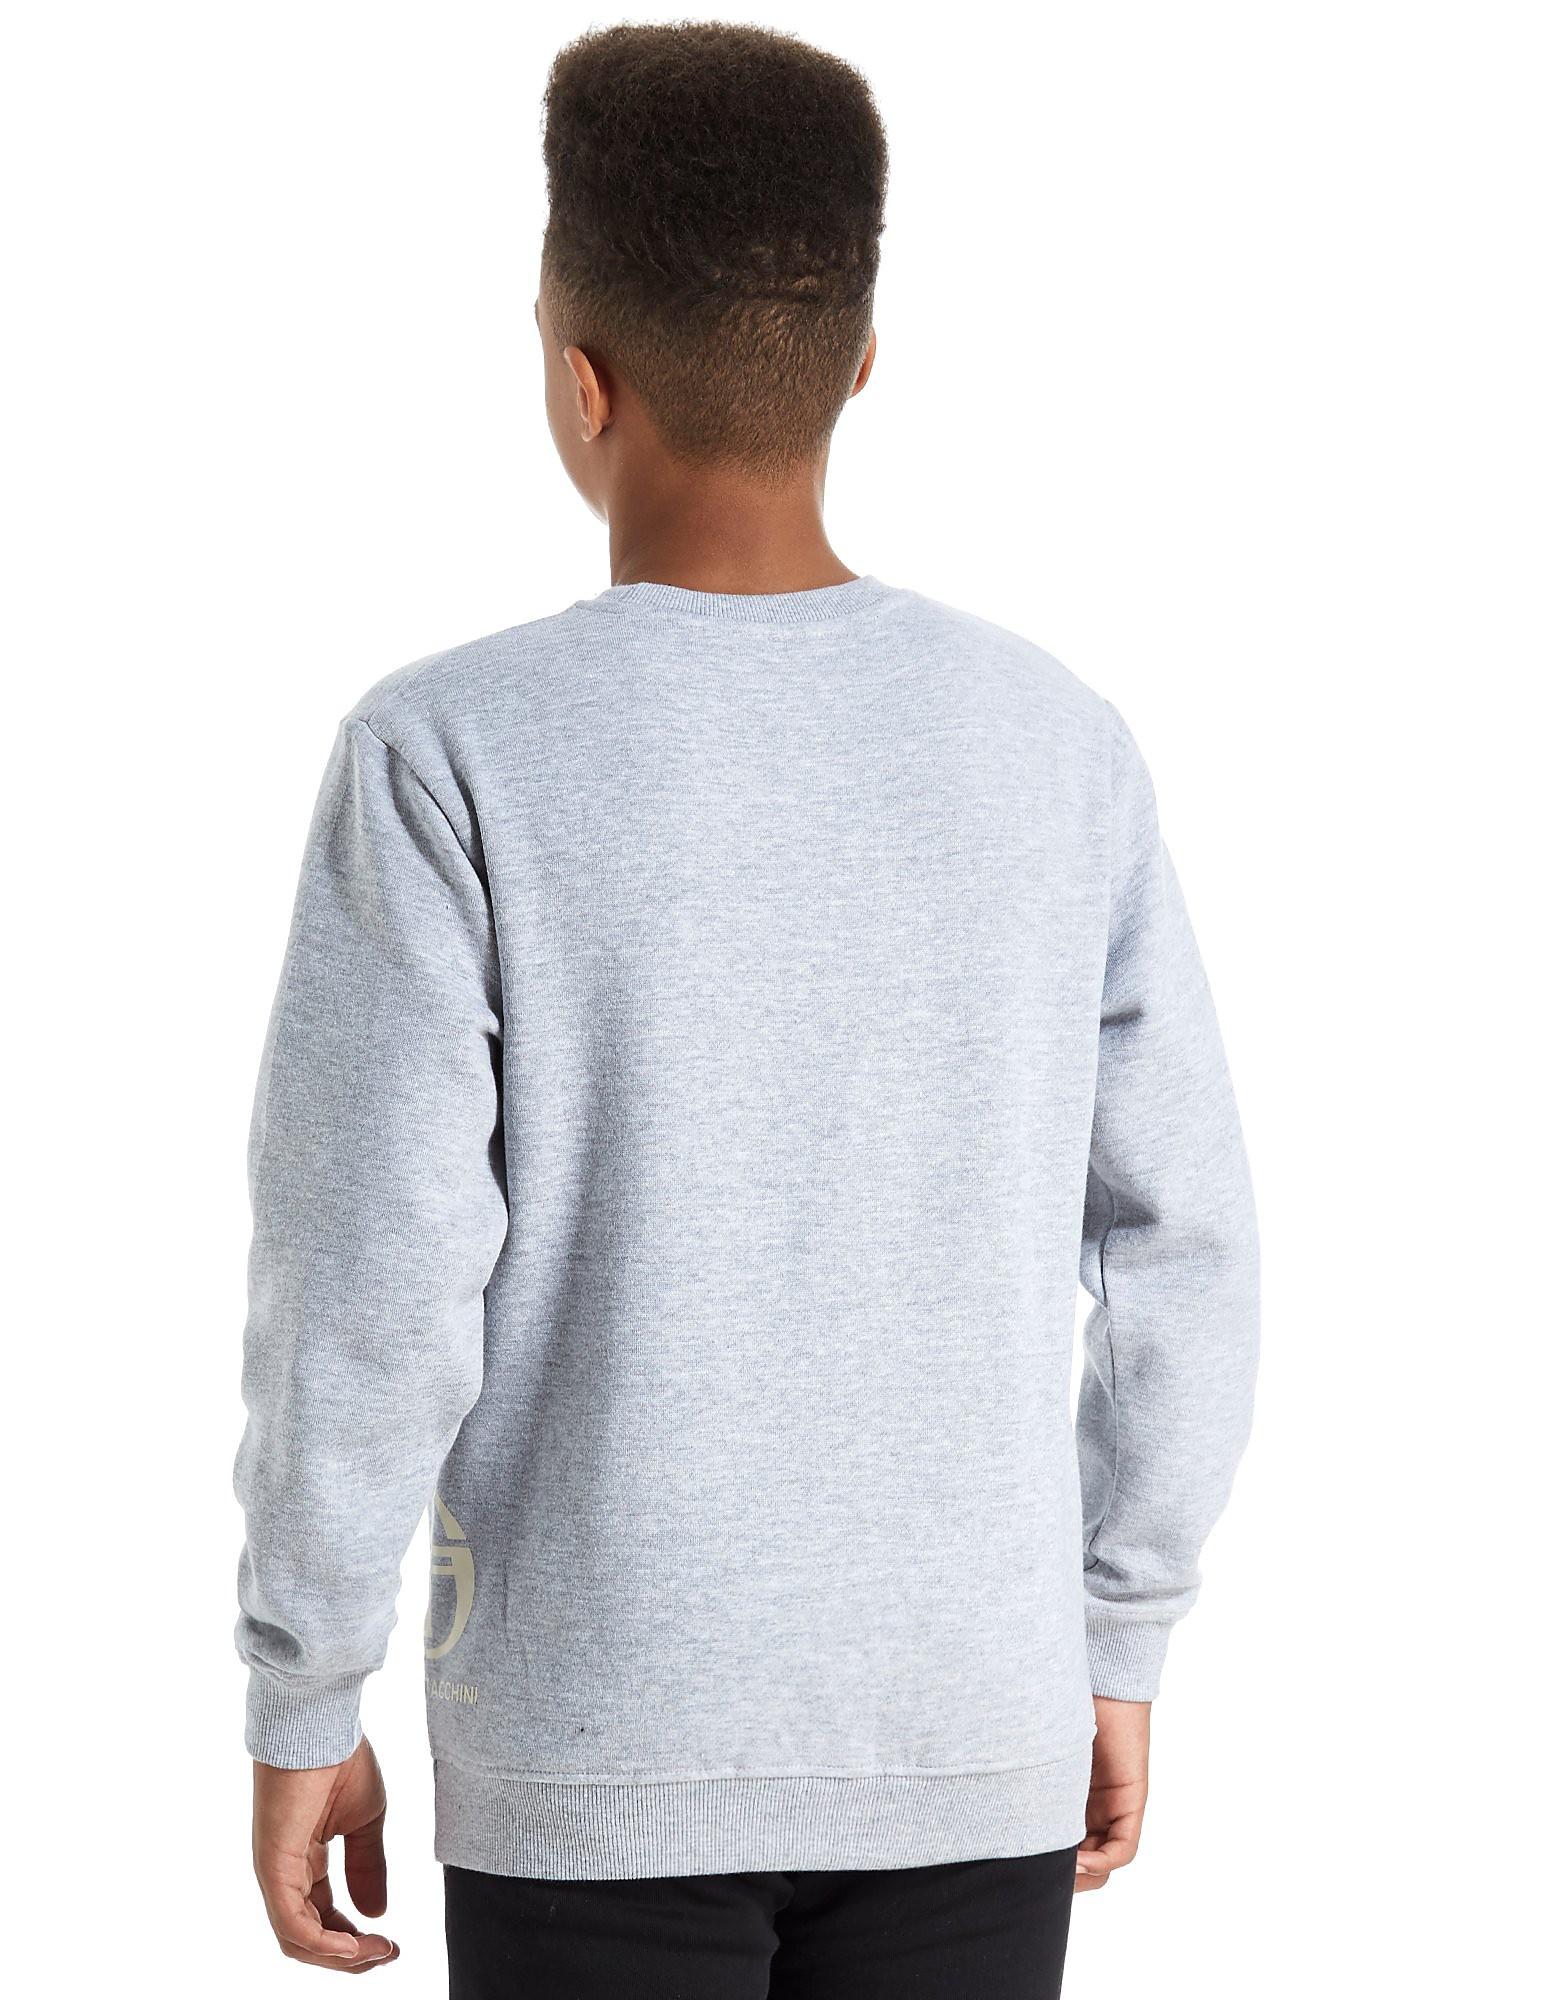 Sergio Tacchini Marzano Sweatshirt Junior